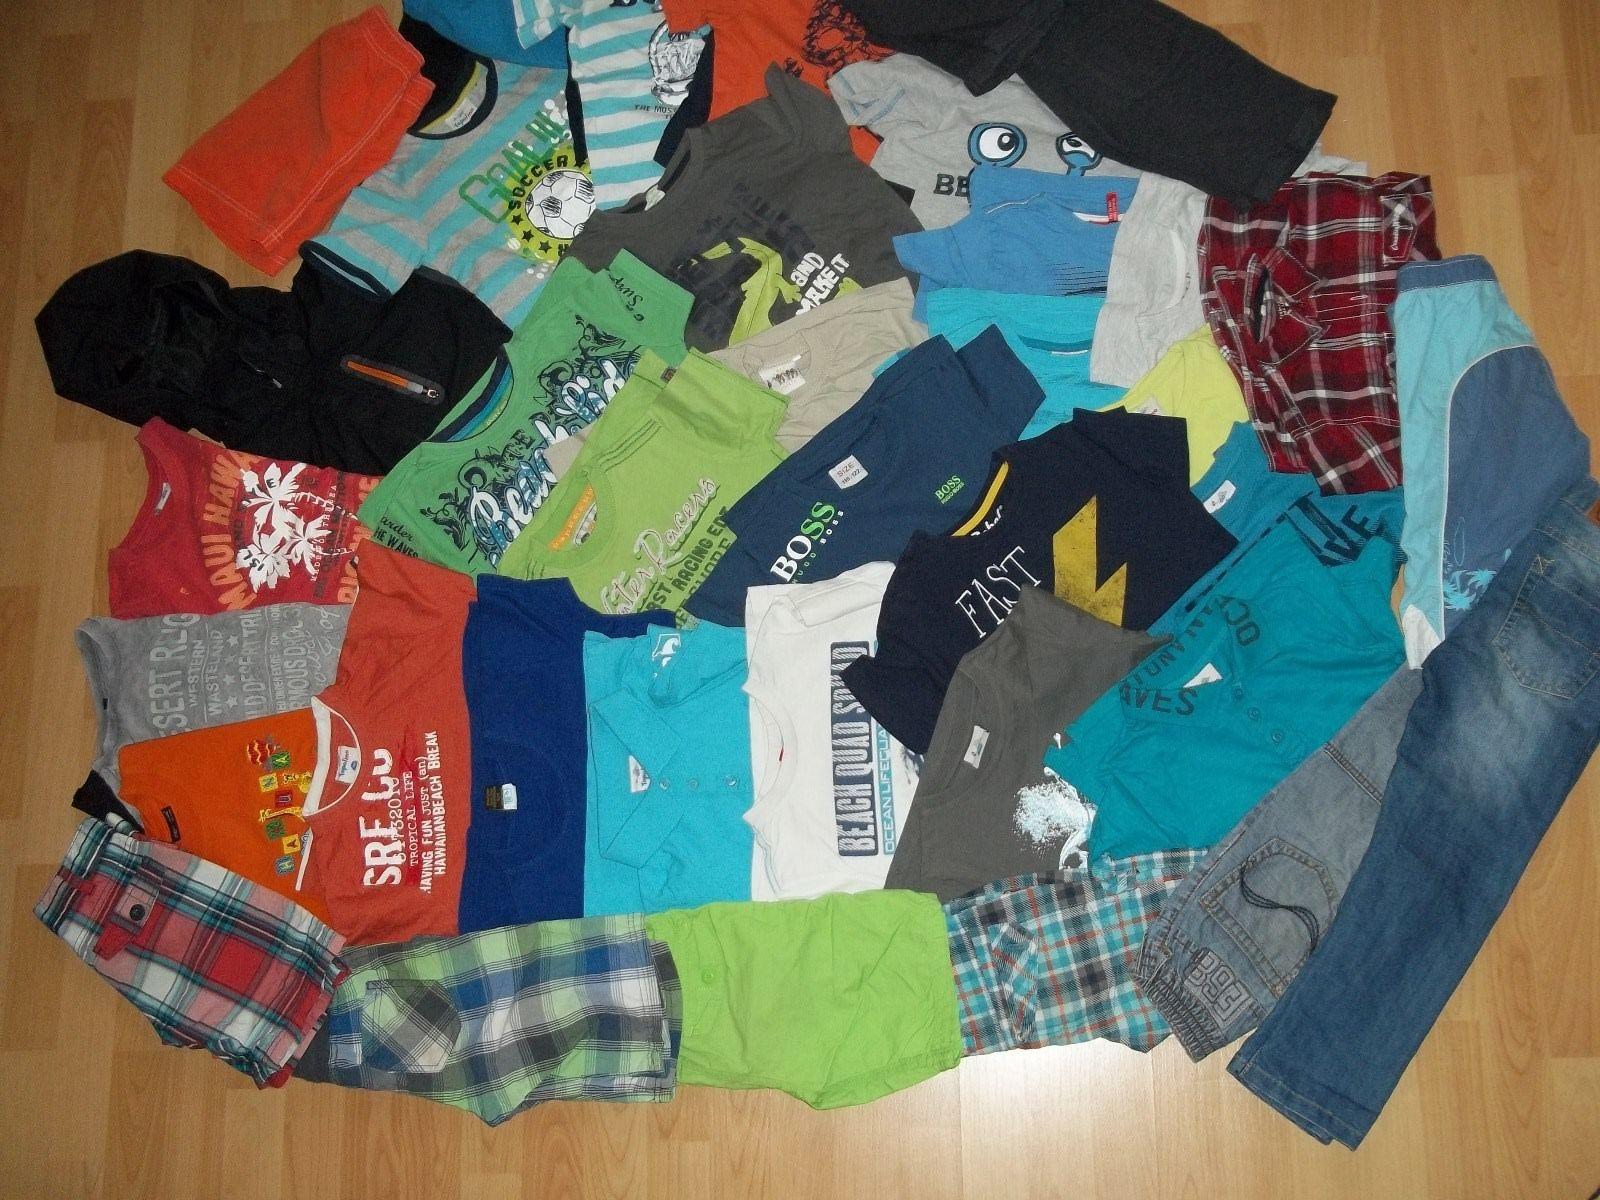 42 tlg. Paket Jungen 110 116 122 T-Shirts Hosen Jacke Killtec Esprit s.Oliver